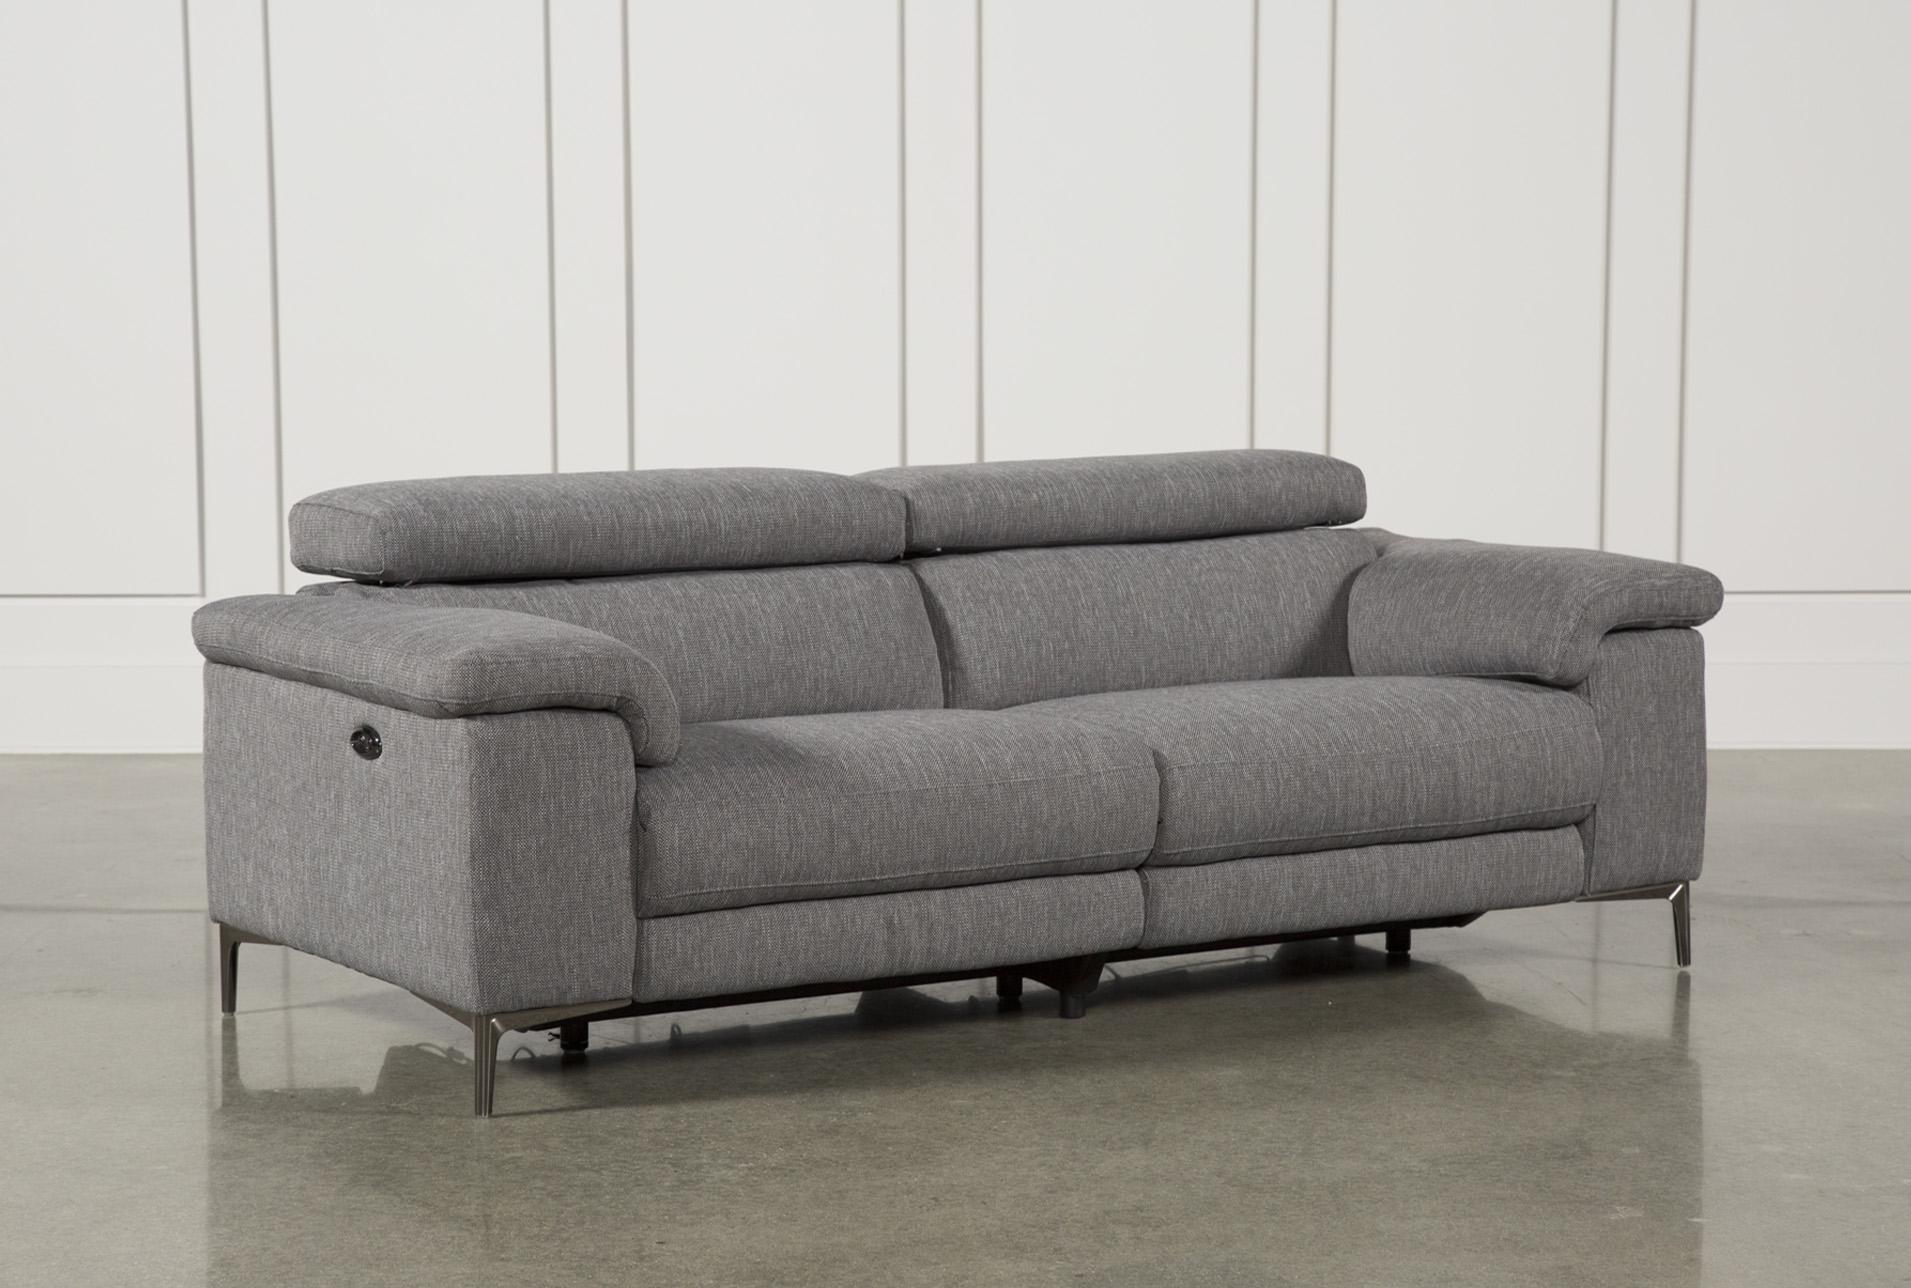 talin grey power reclining sofa w usb living spacesContemporary Rexlining Sofas #1